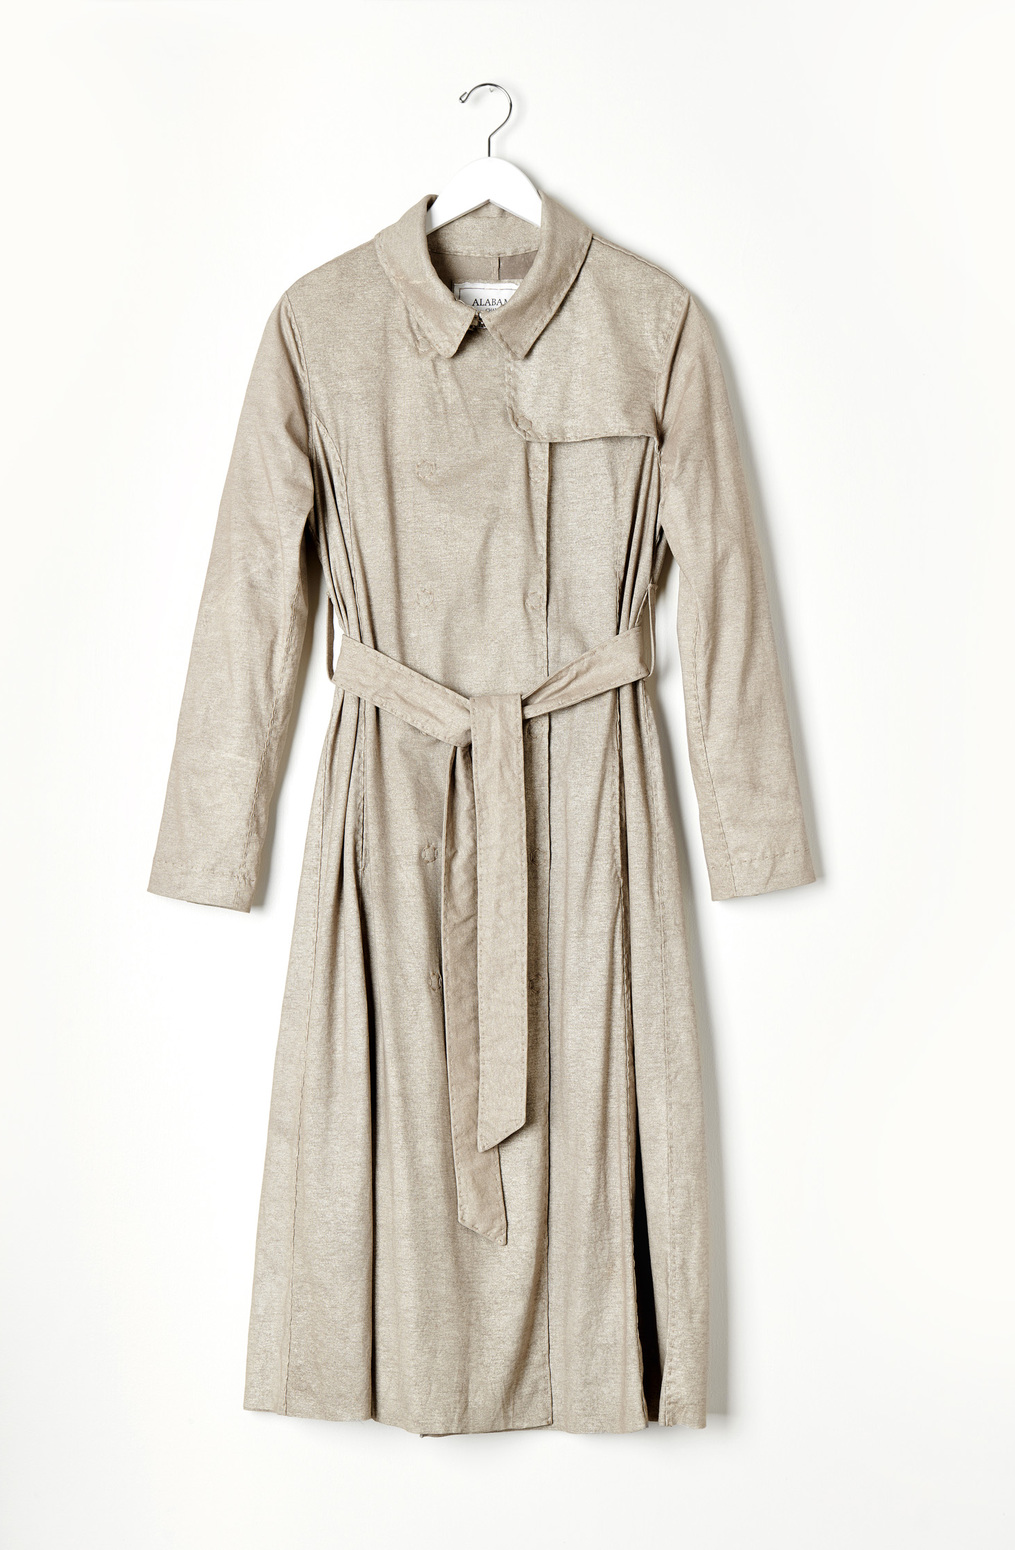 Alabama chanin the classic trench coat 3